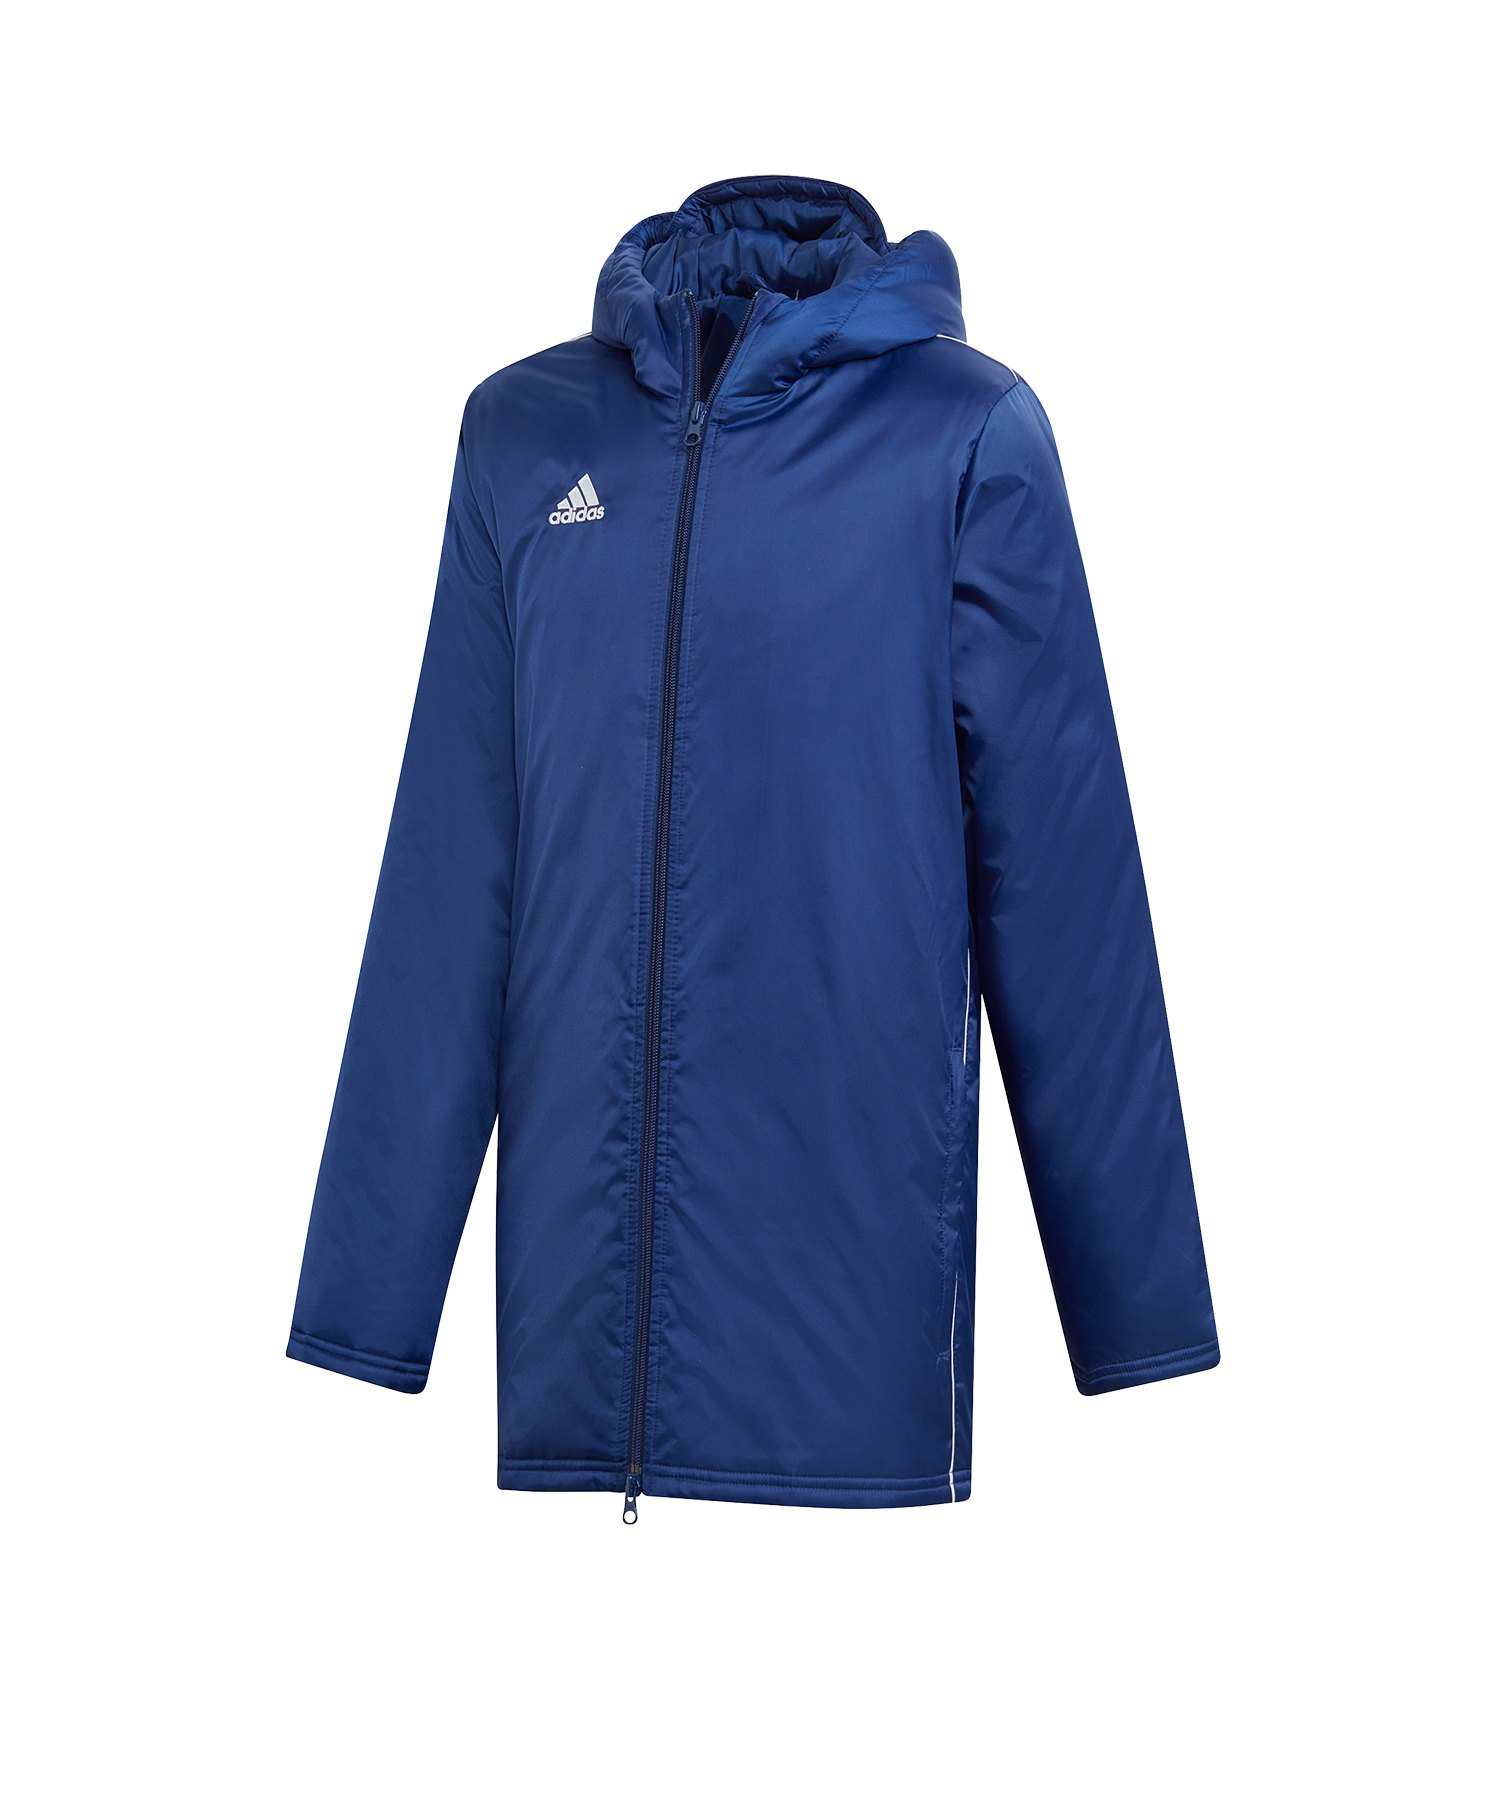 Damen Cross Adidas Winterjacke Coachjacke Country 9YeDIWEH2